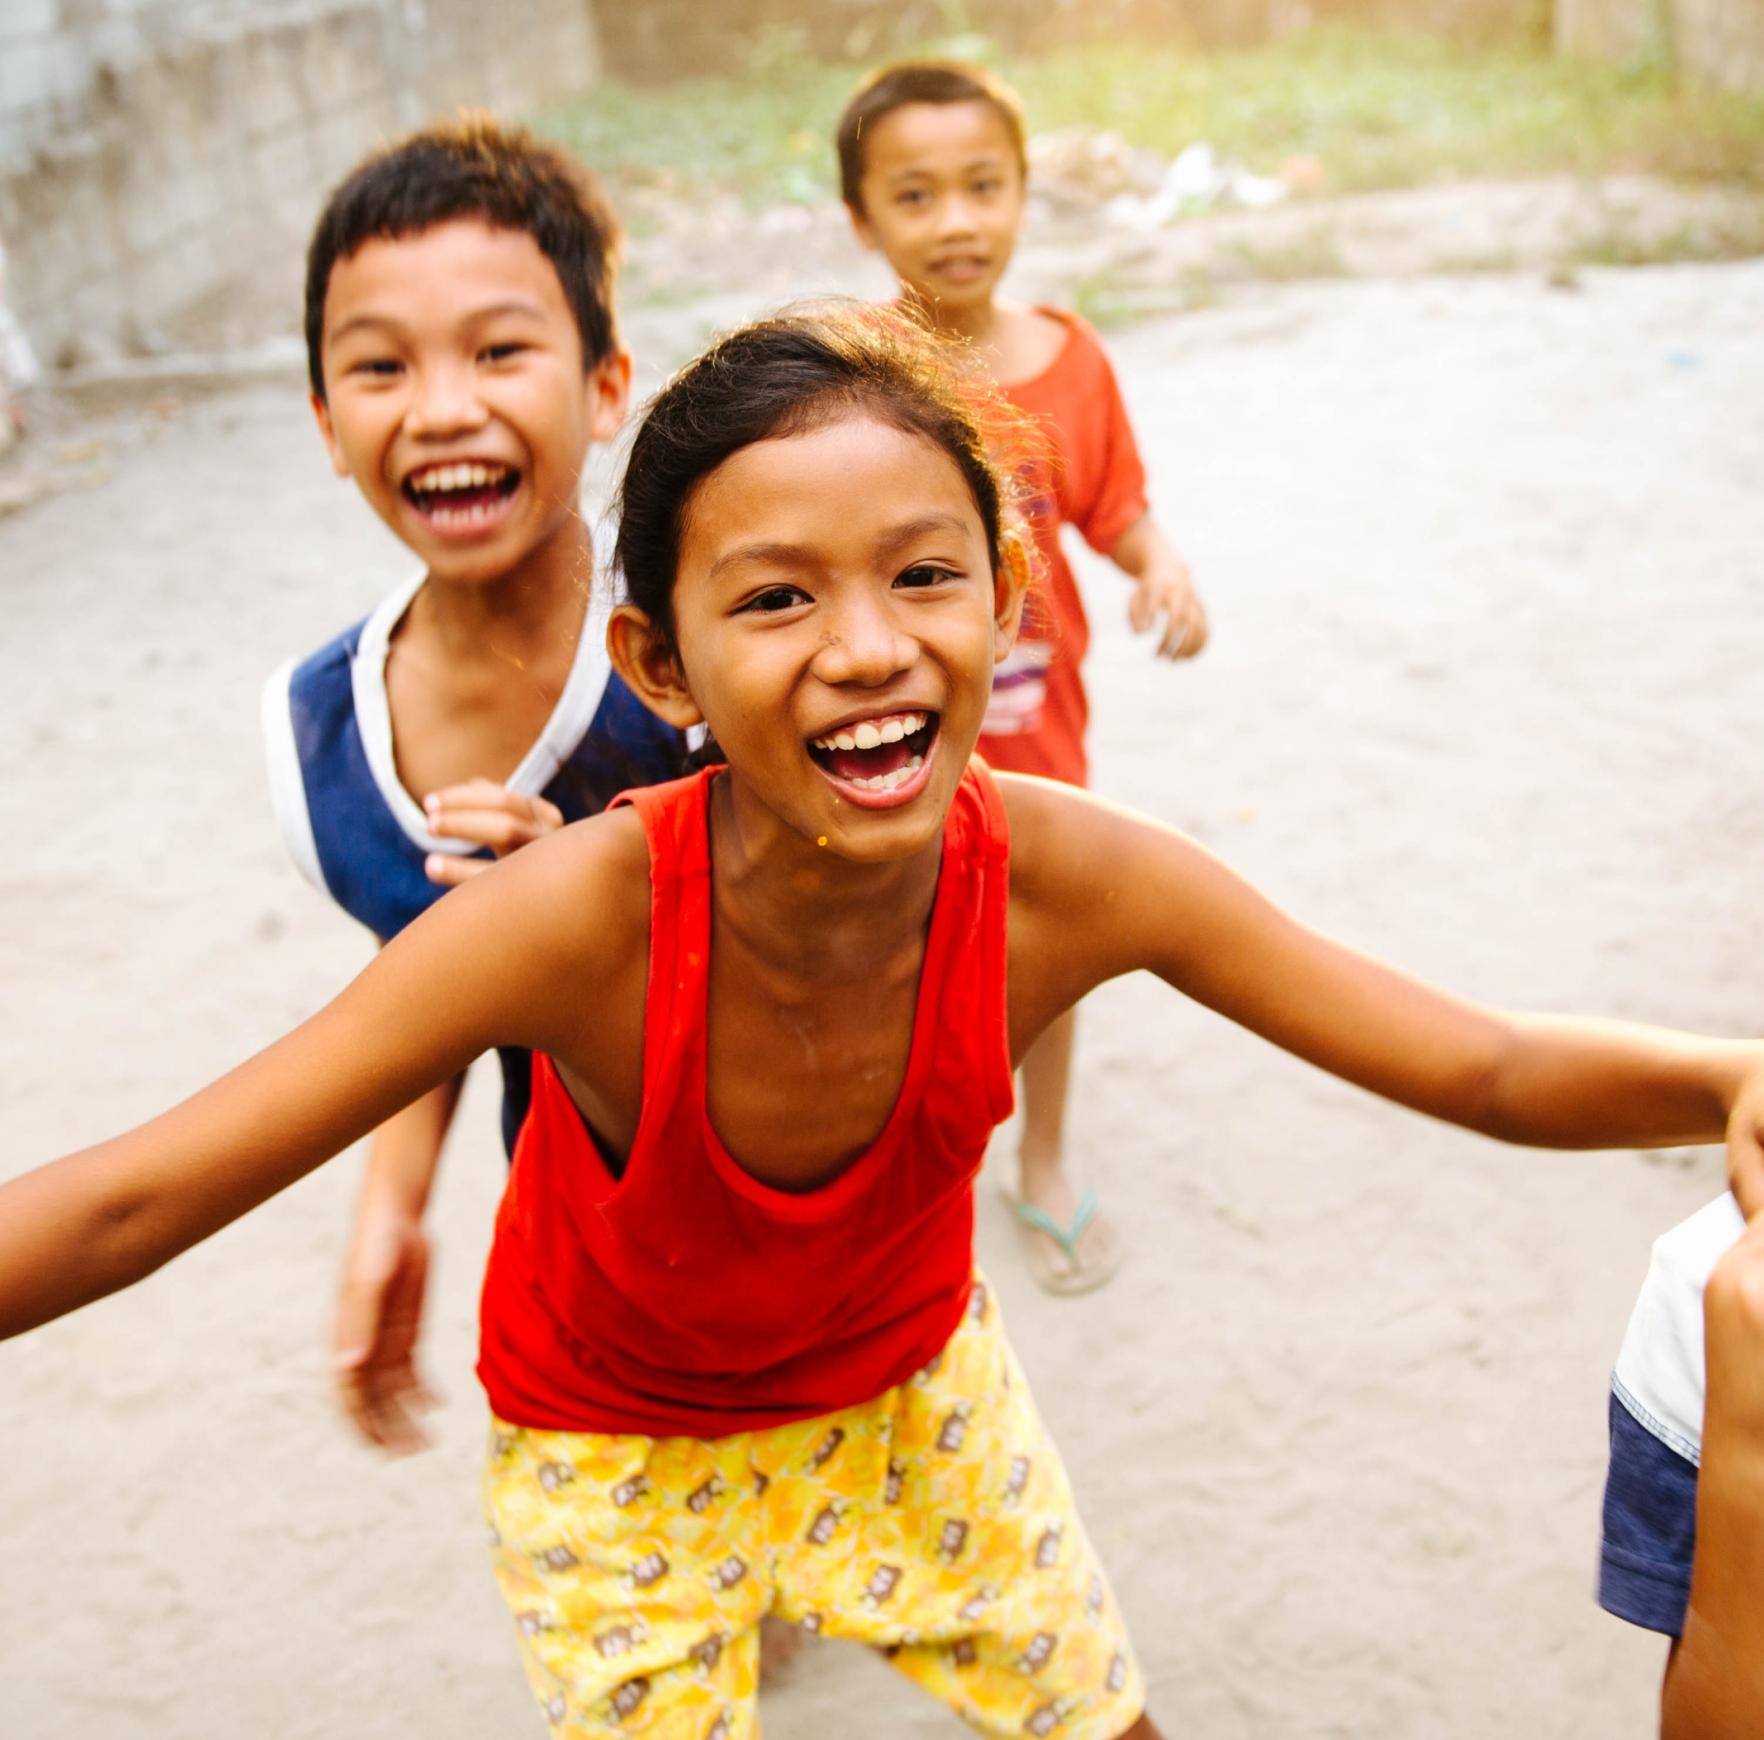 Filipino children smiling